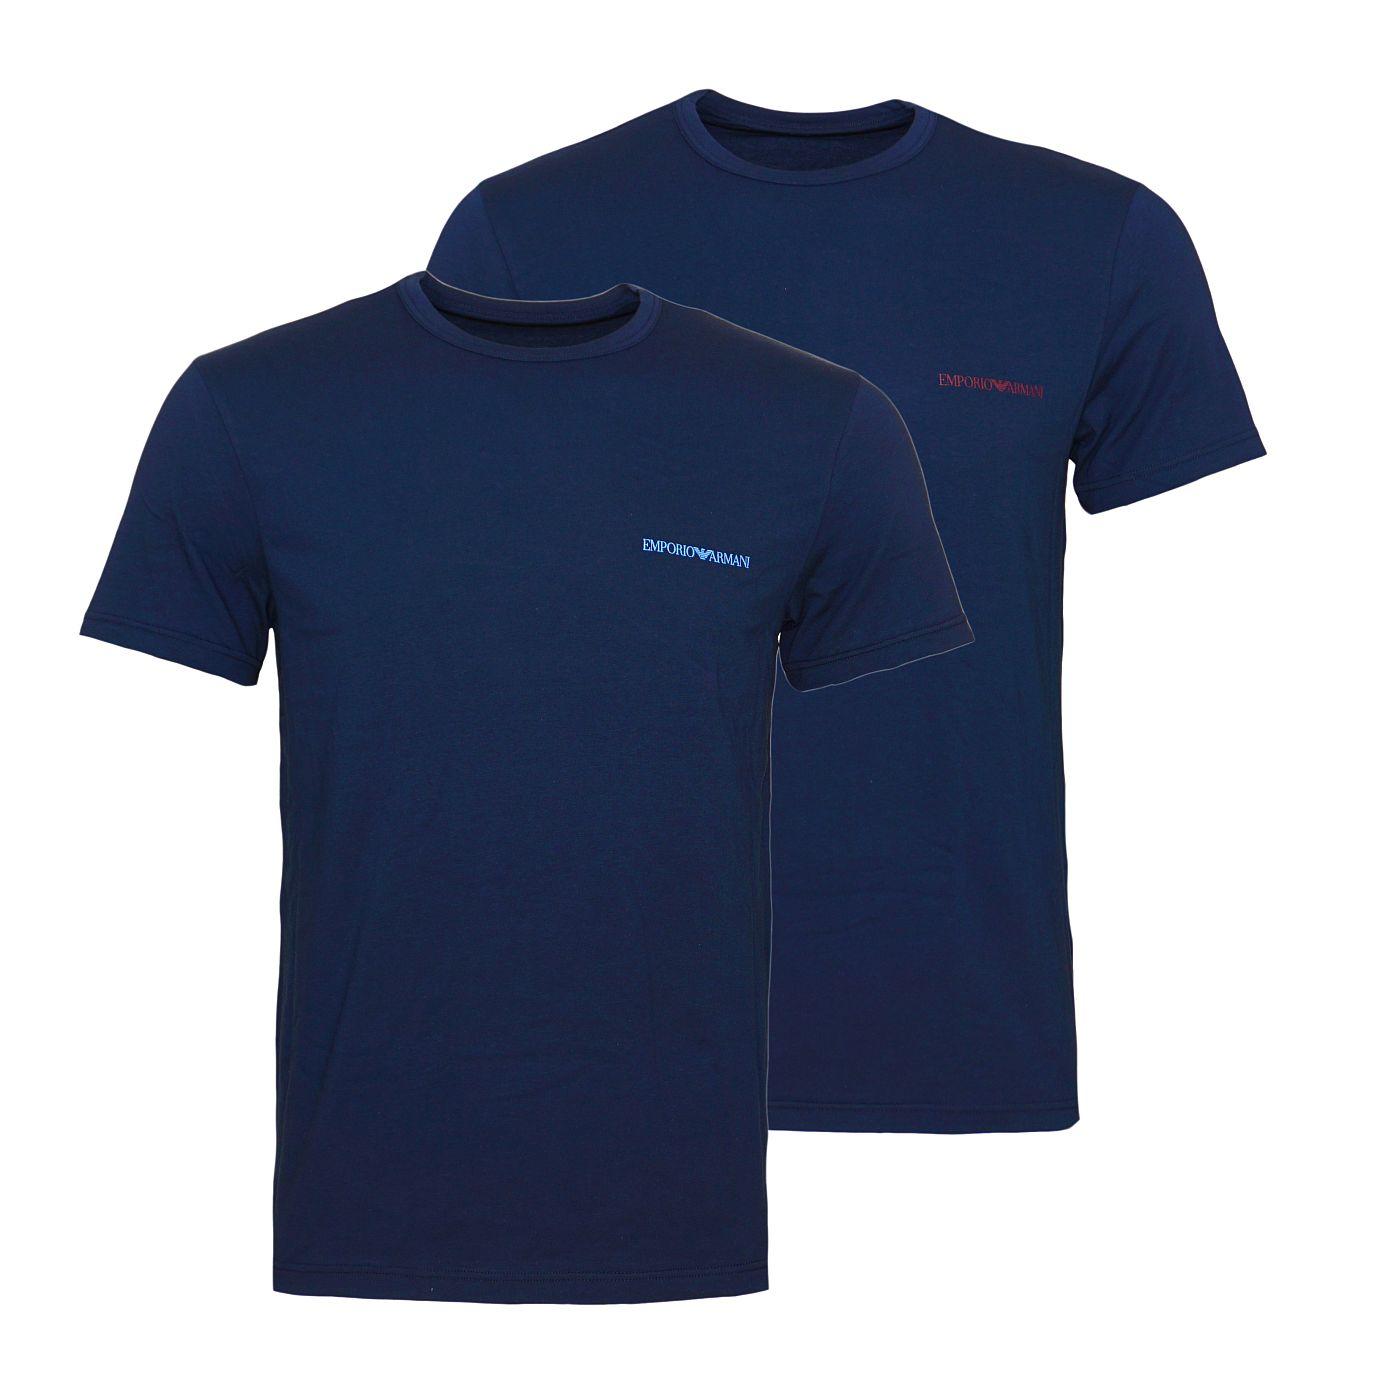 Emporio Armani 2er Pack T-Shirts Rundhals 111267 8A717 27435 MARINE/MARINE SH18-EAT1